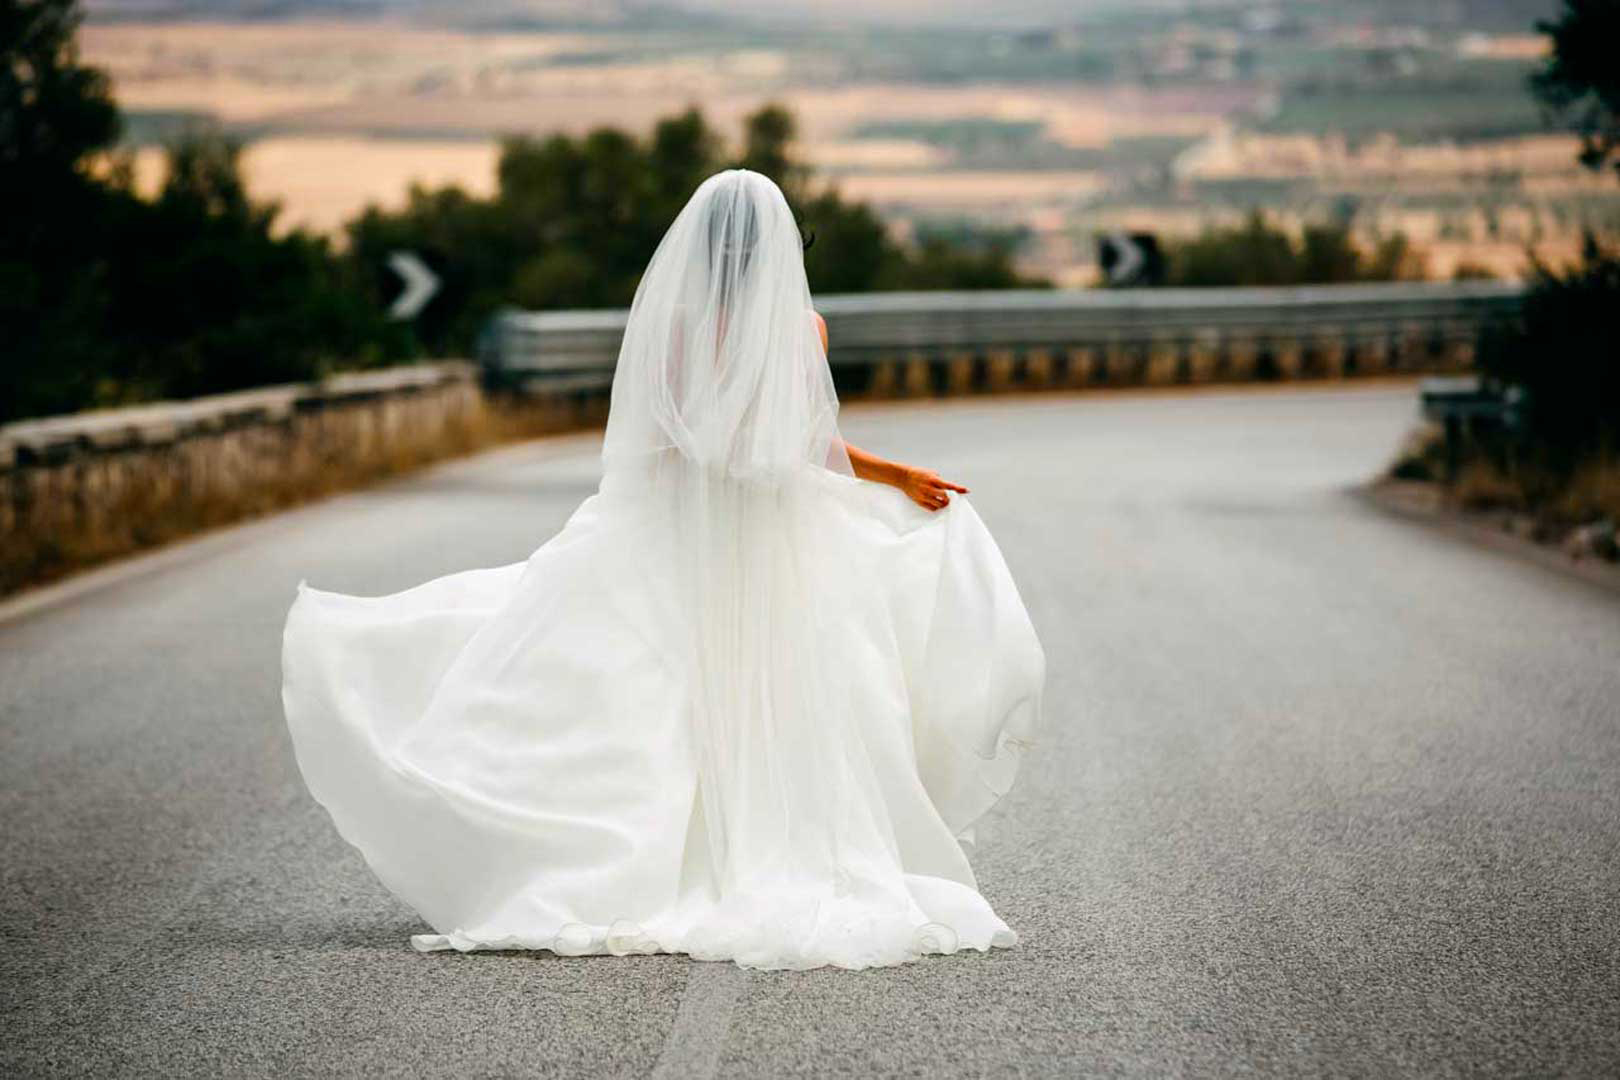 024-abito-sposa-gianni-lepore-fotografo-lucera